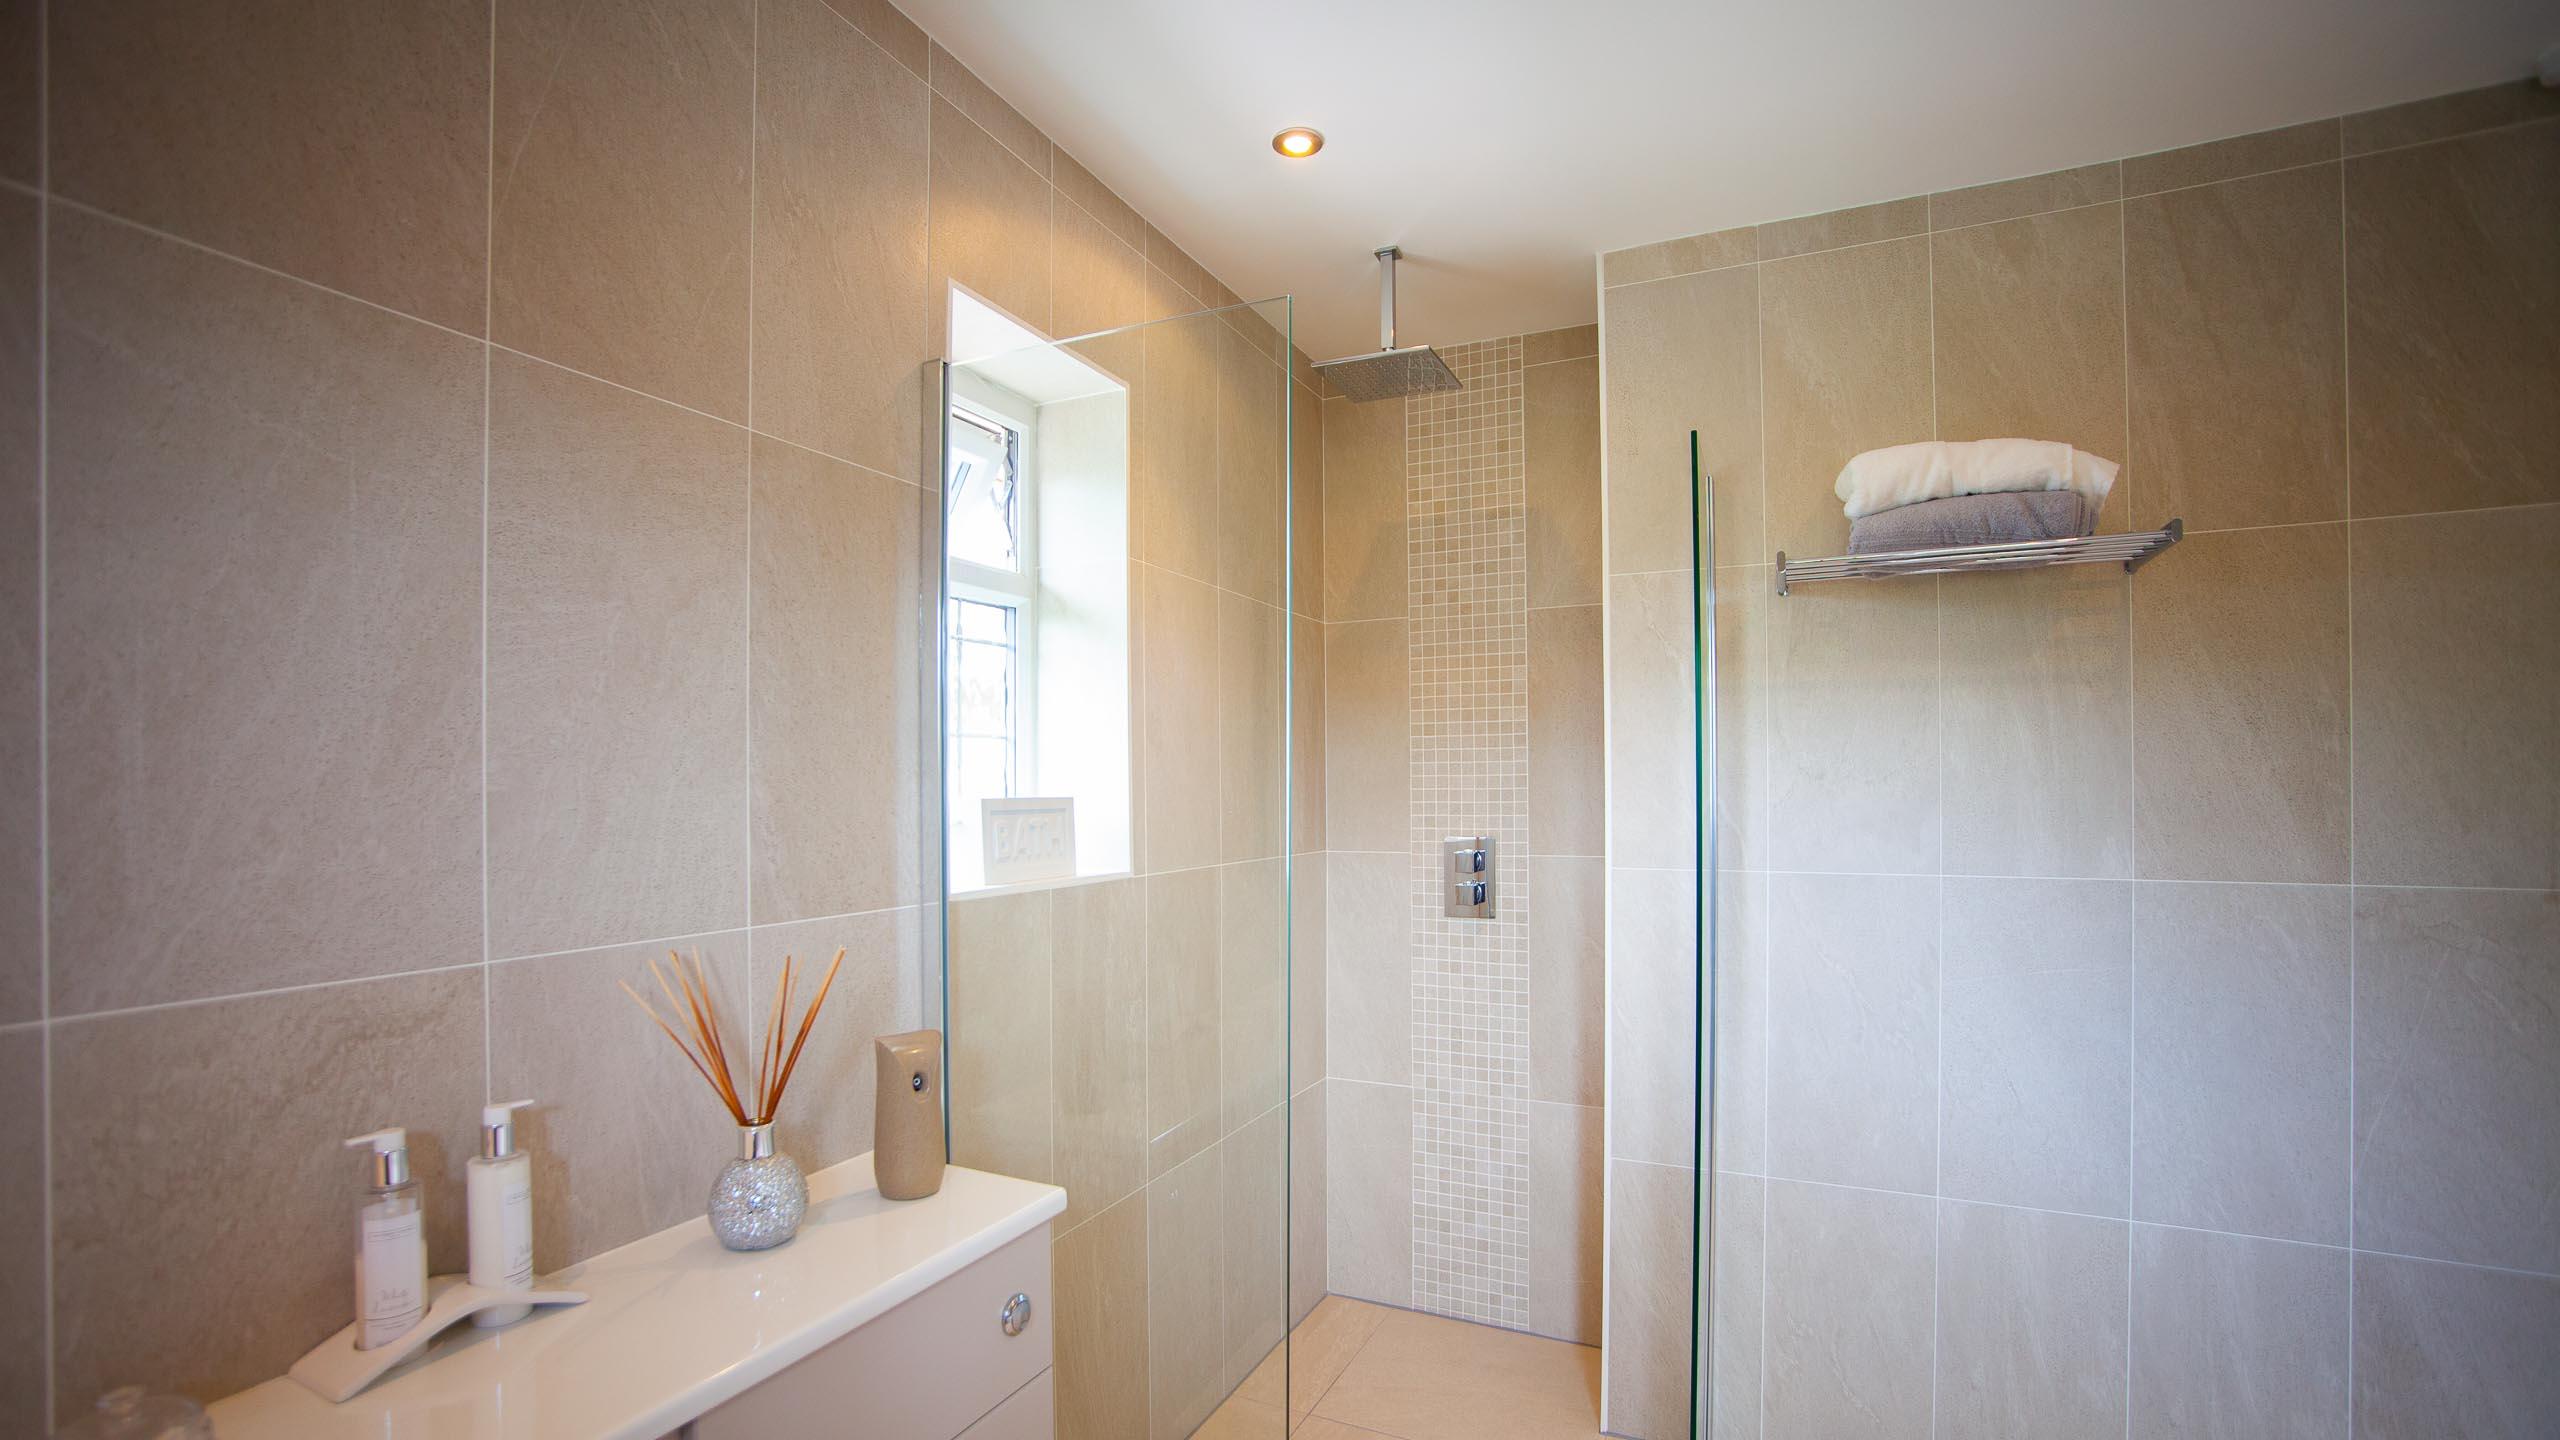 modern bathroom shower - bathroom installation by RJ Steele builders in Sussex